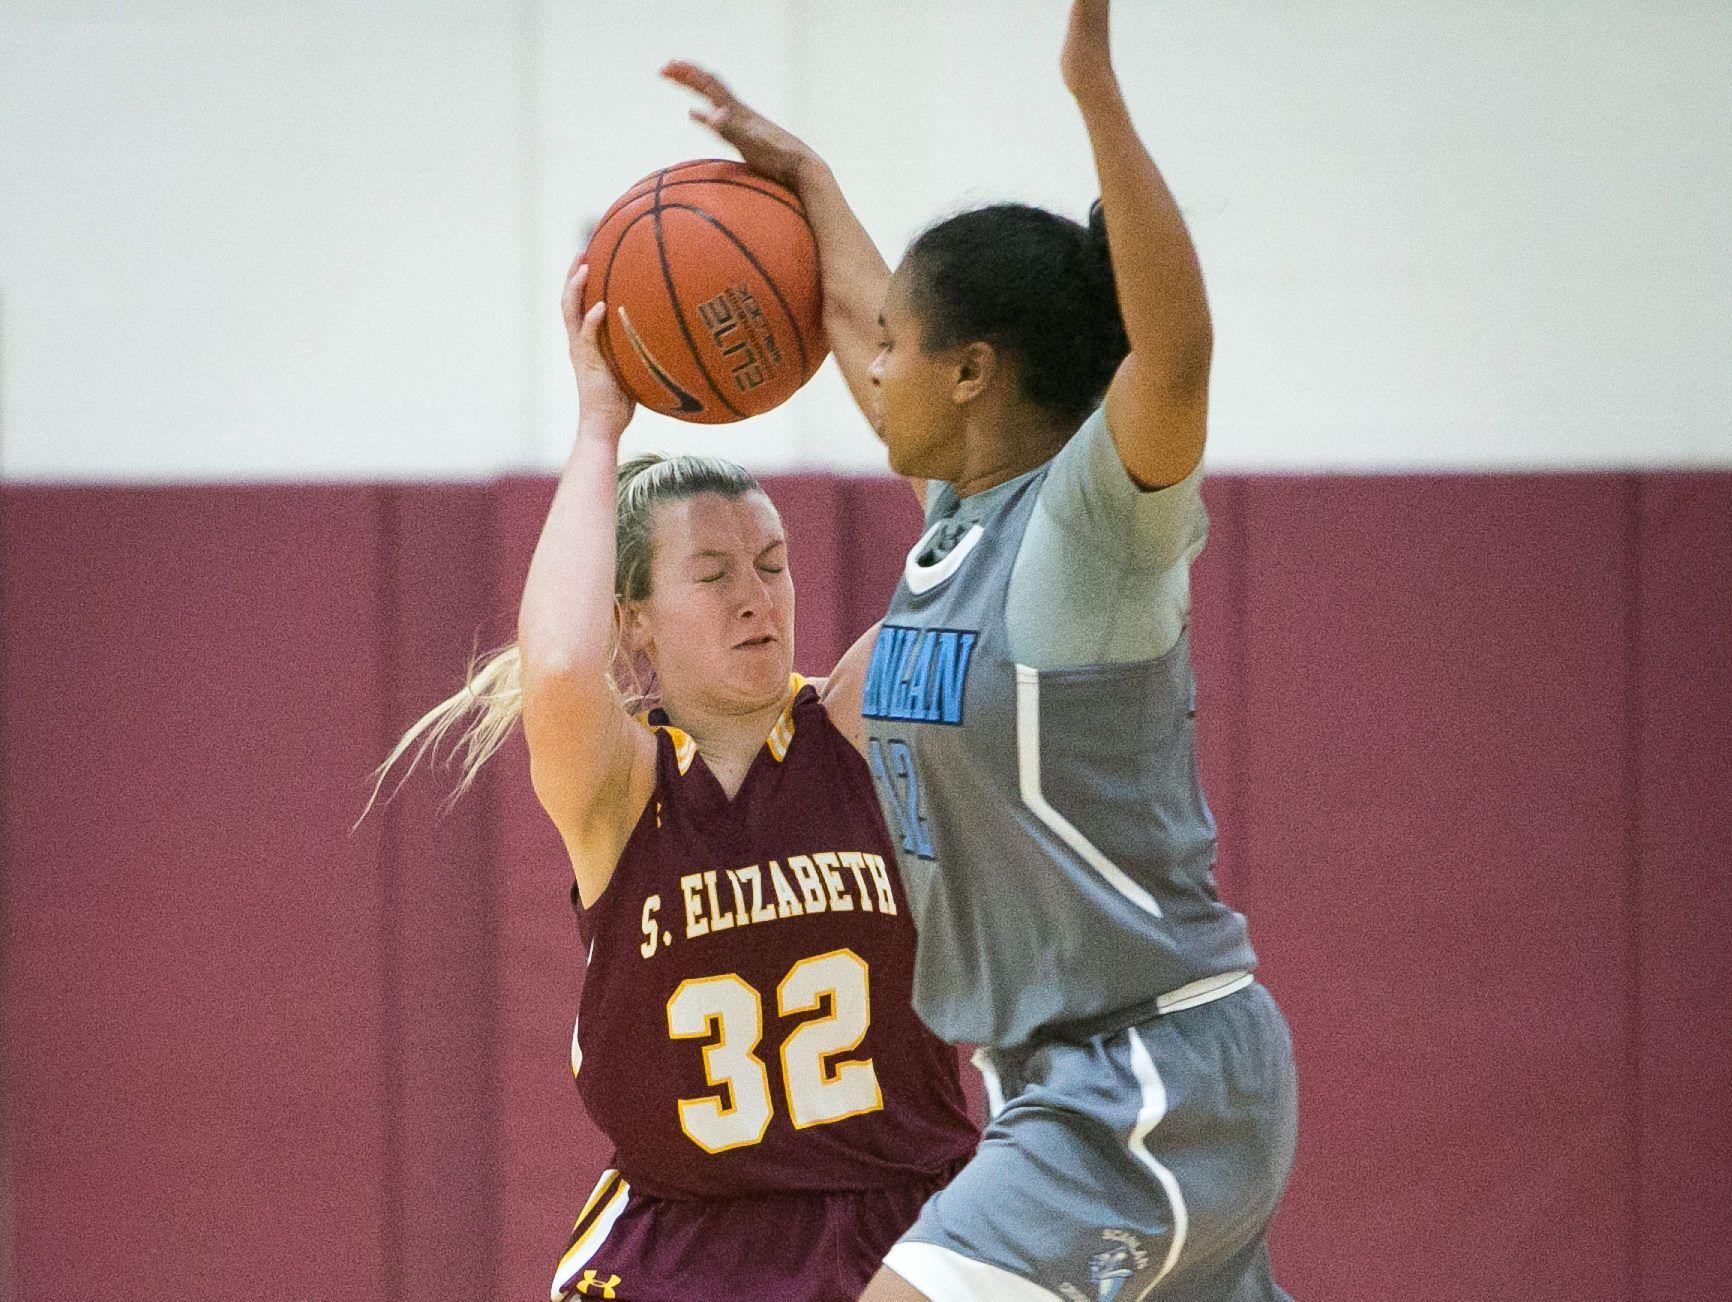 St. Elizabeth guard, Lexi Bromwell gets pressure from Monsignor Scanlan guard, Daja Wentz.